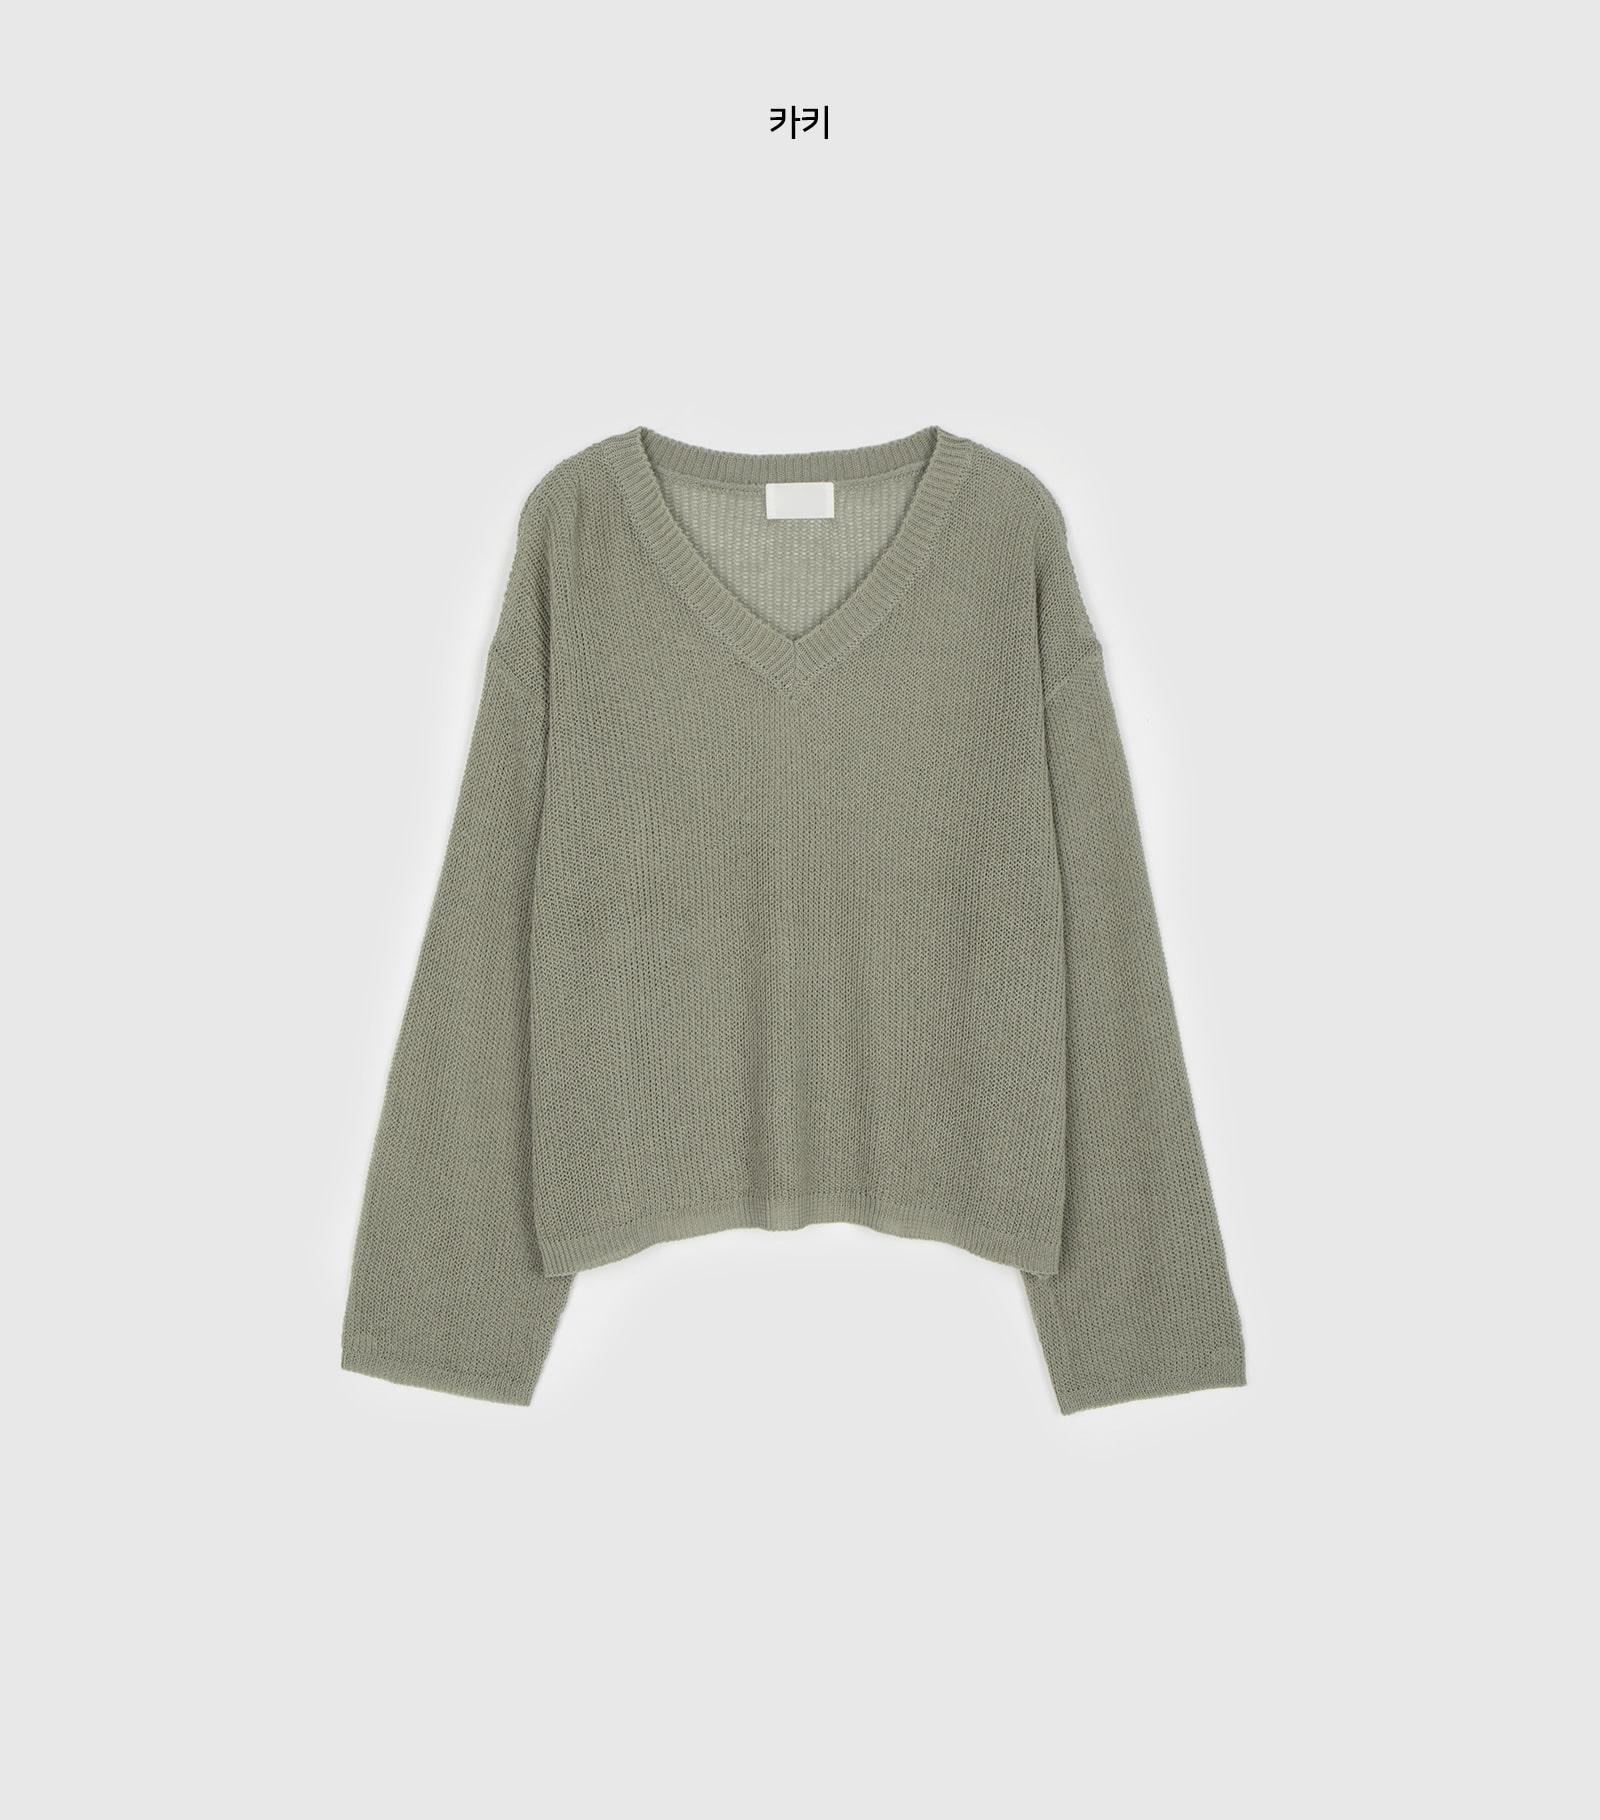 Verano see-through over V-neck knit